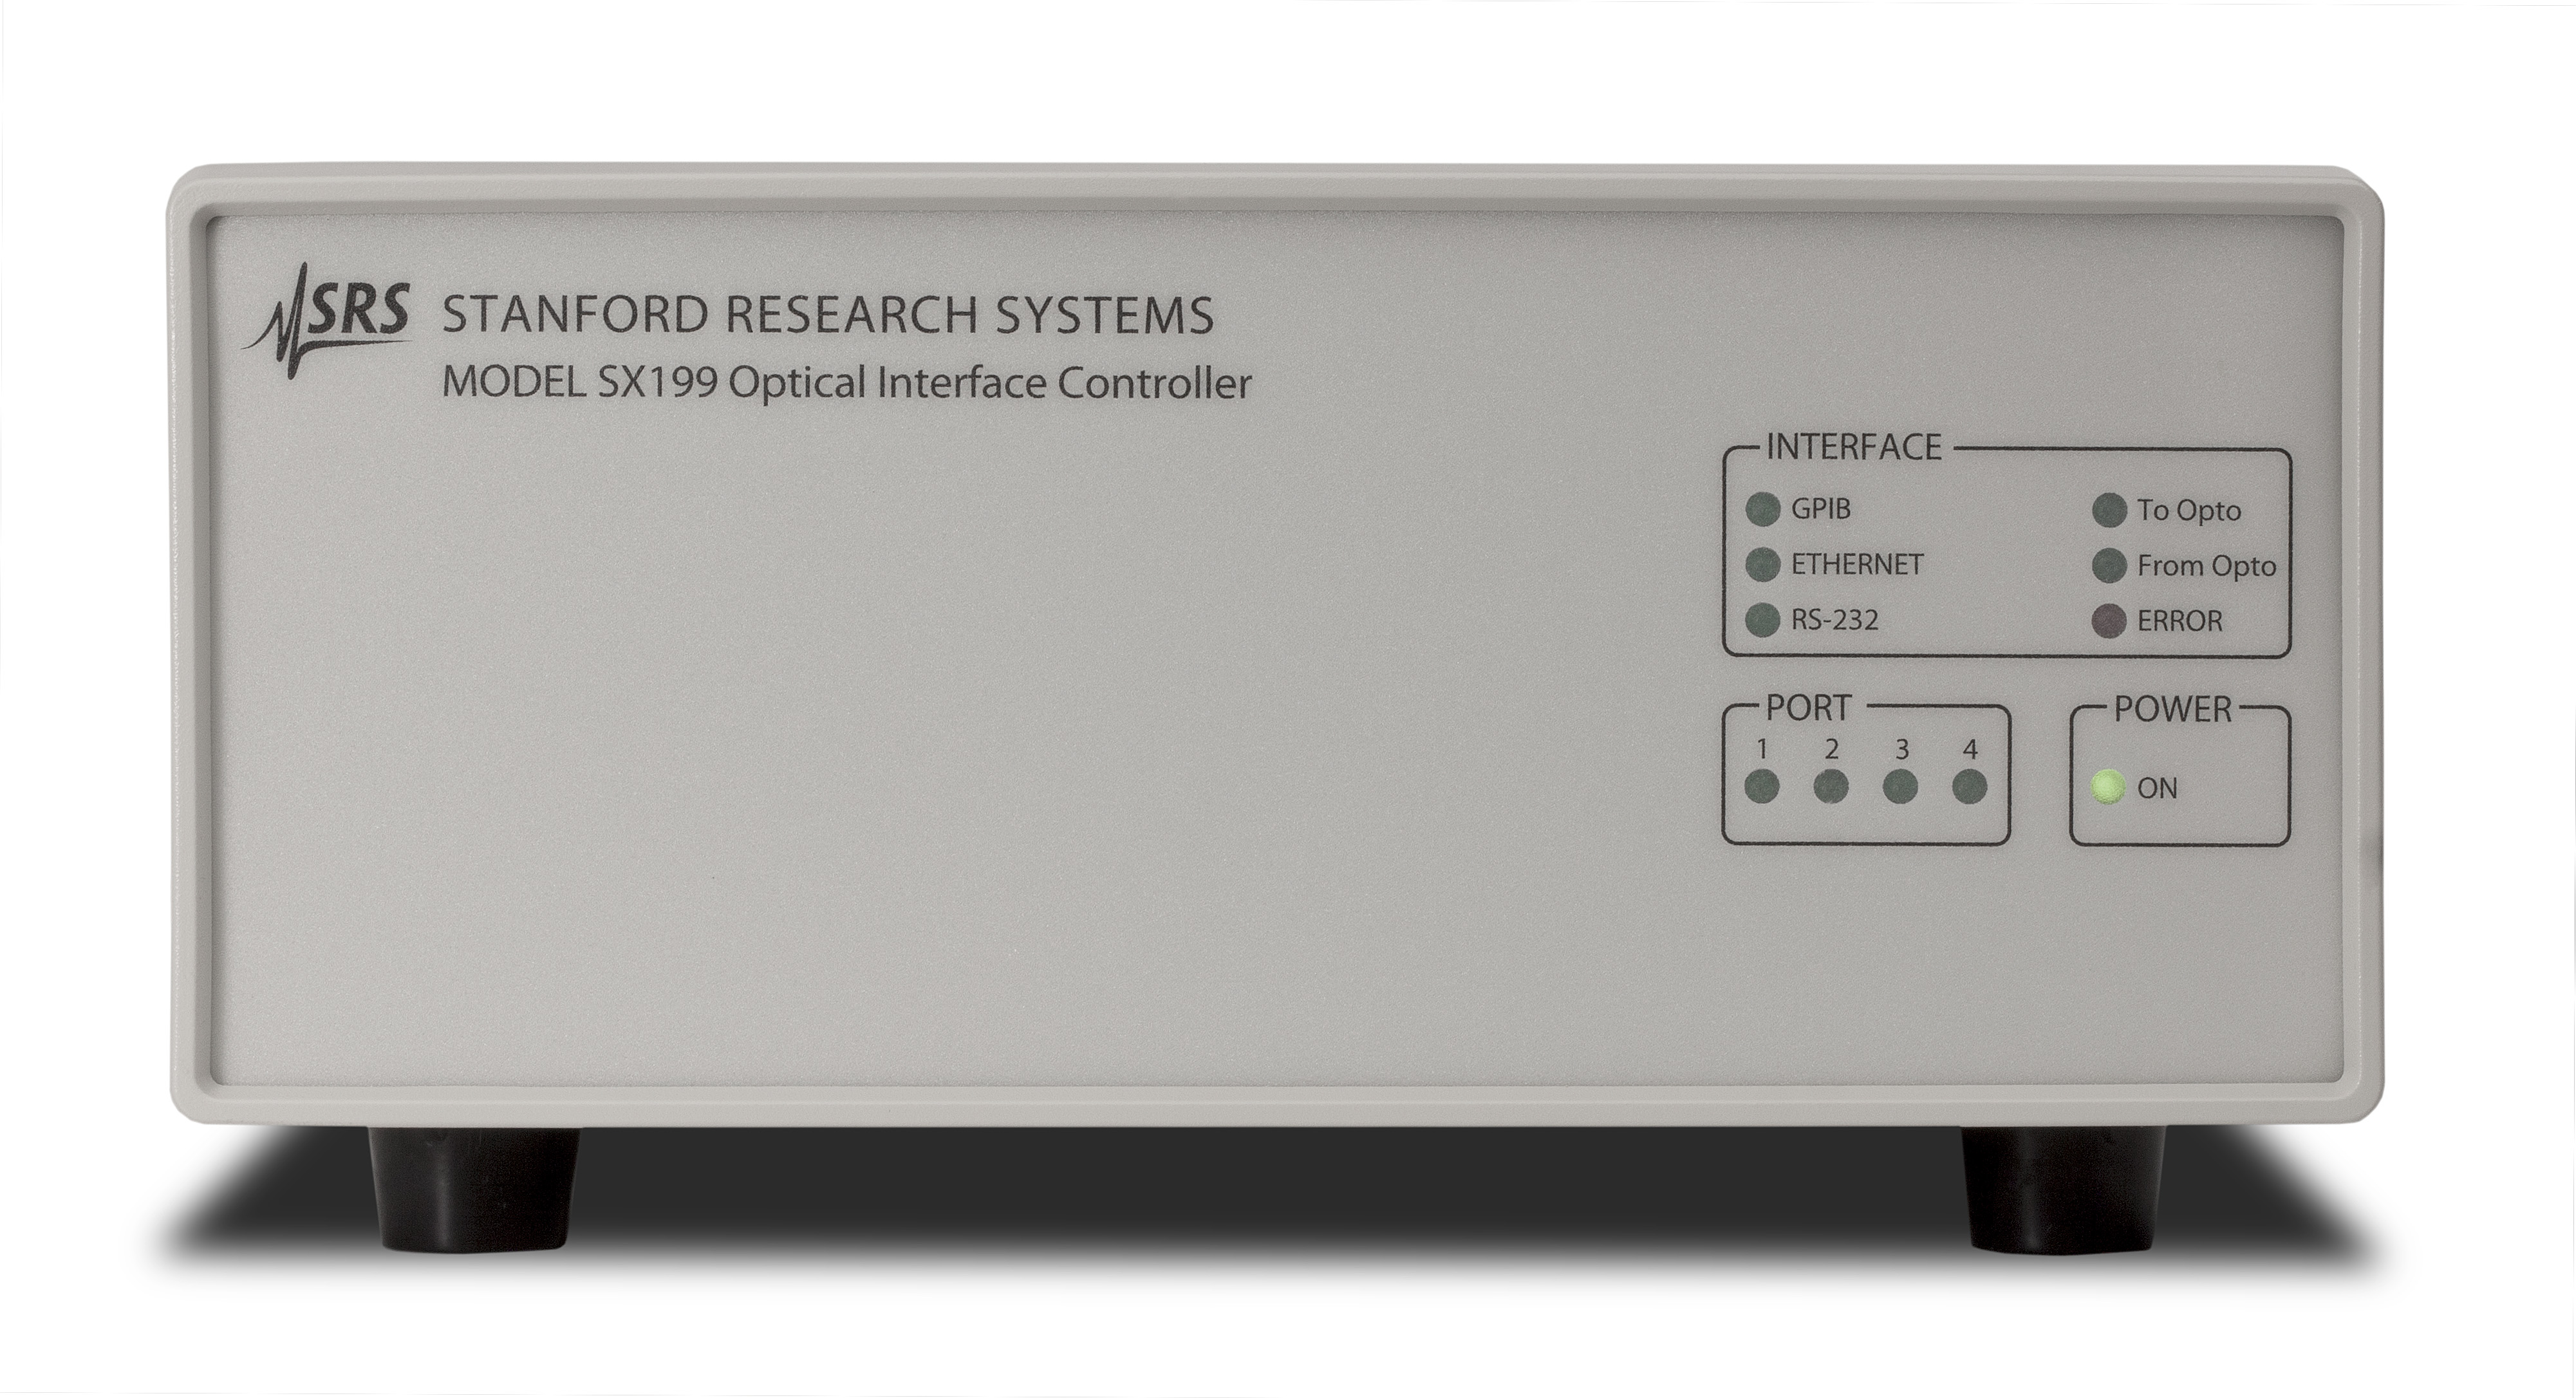 Stanford Research Systems SX199 Контроллер оптического интерфейса